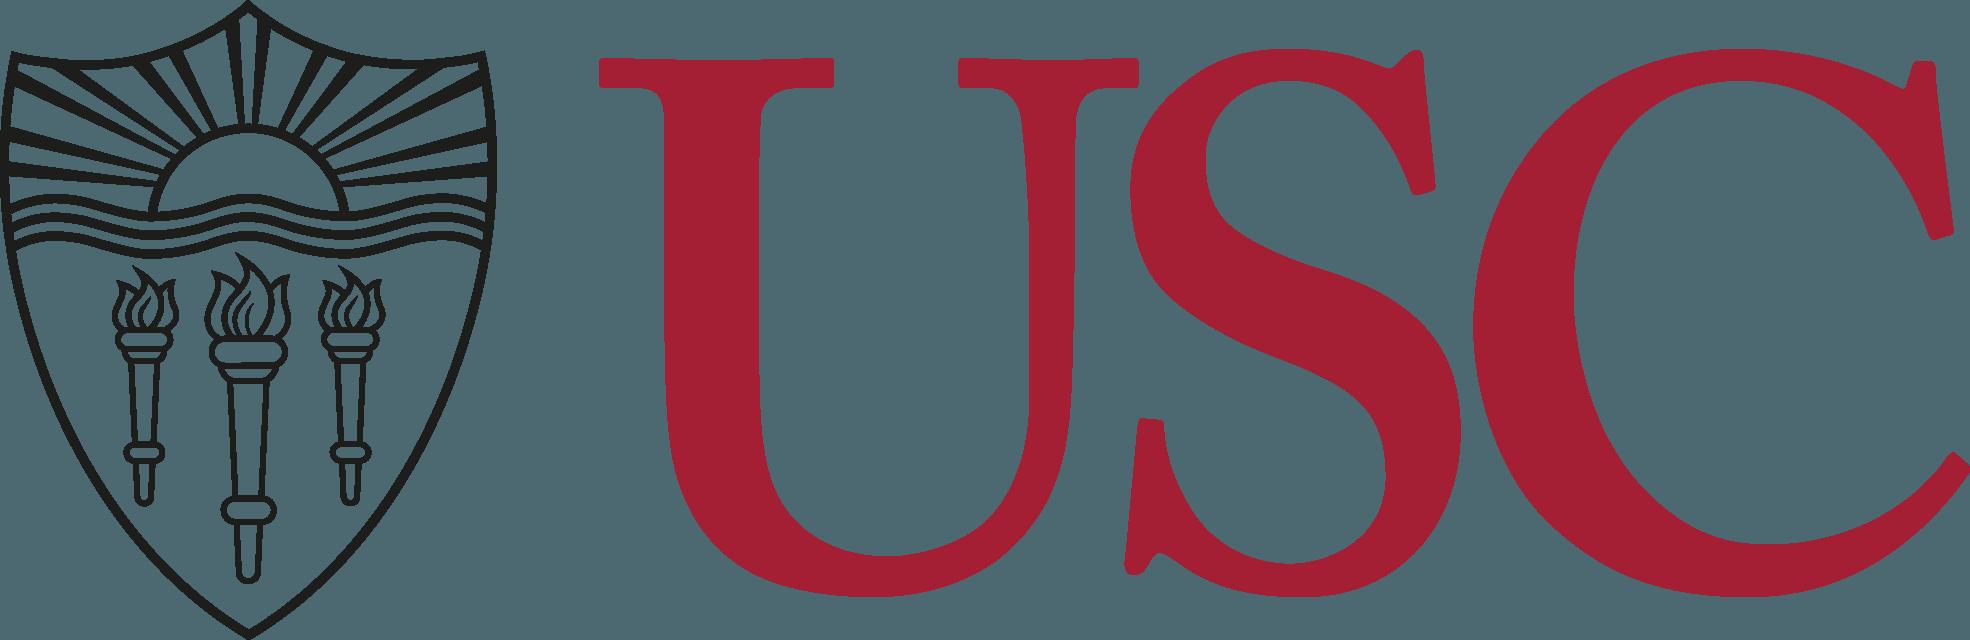 California southern. Usc logo university of